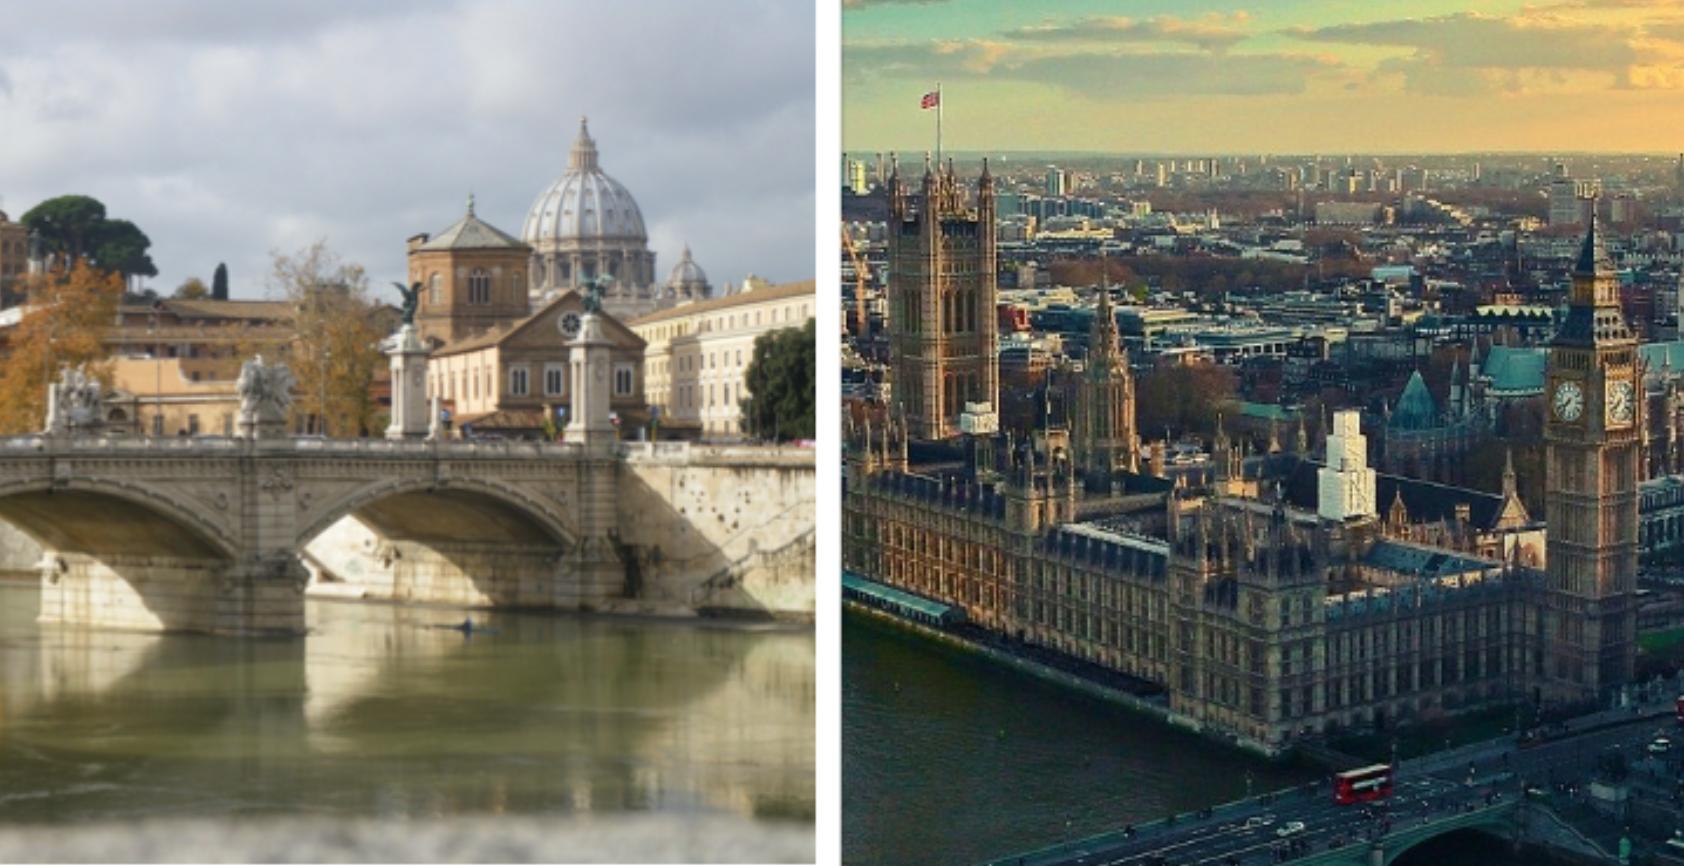 Coronavirus: Will the UK's outbreak be as bad as Italy's? Health experts explain